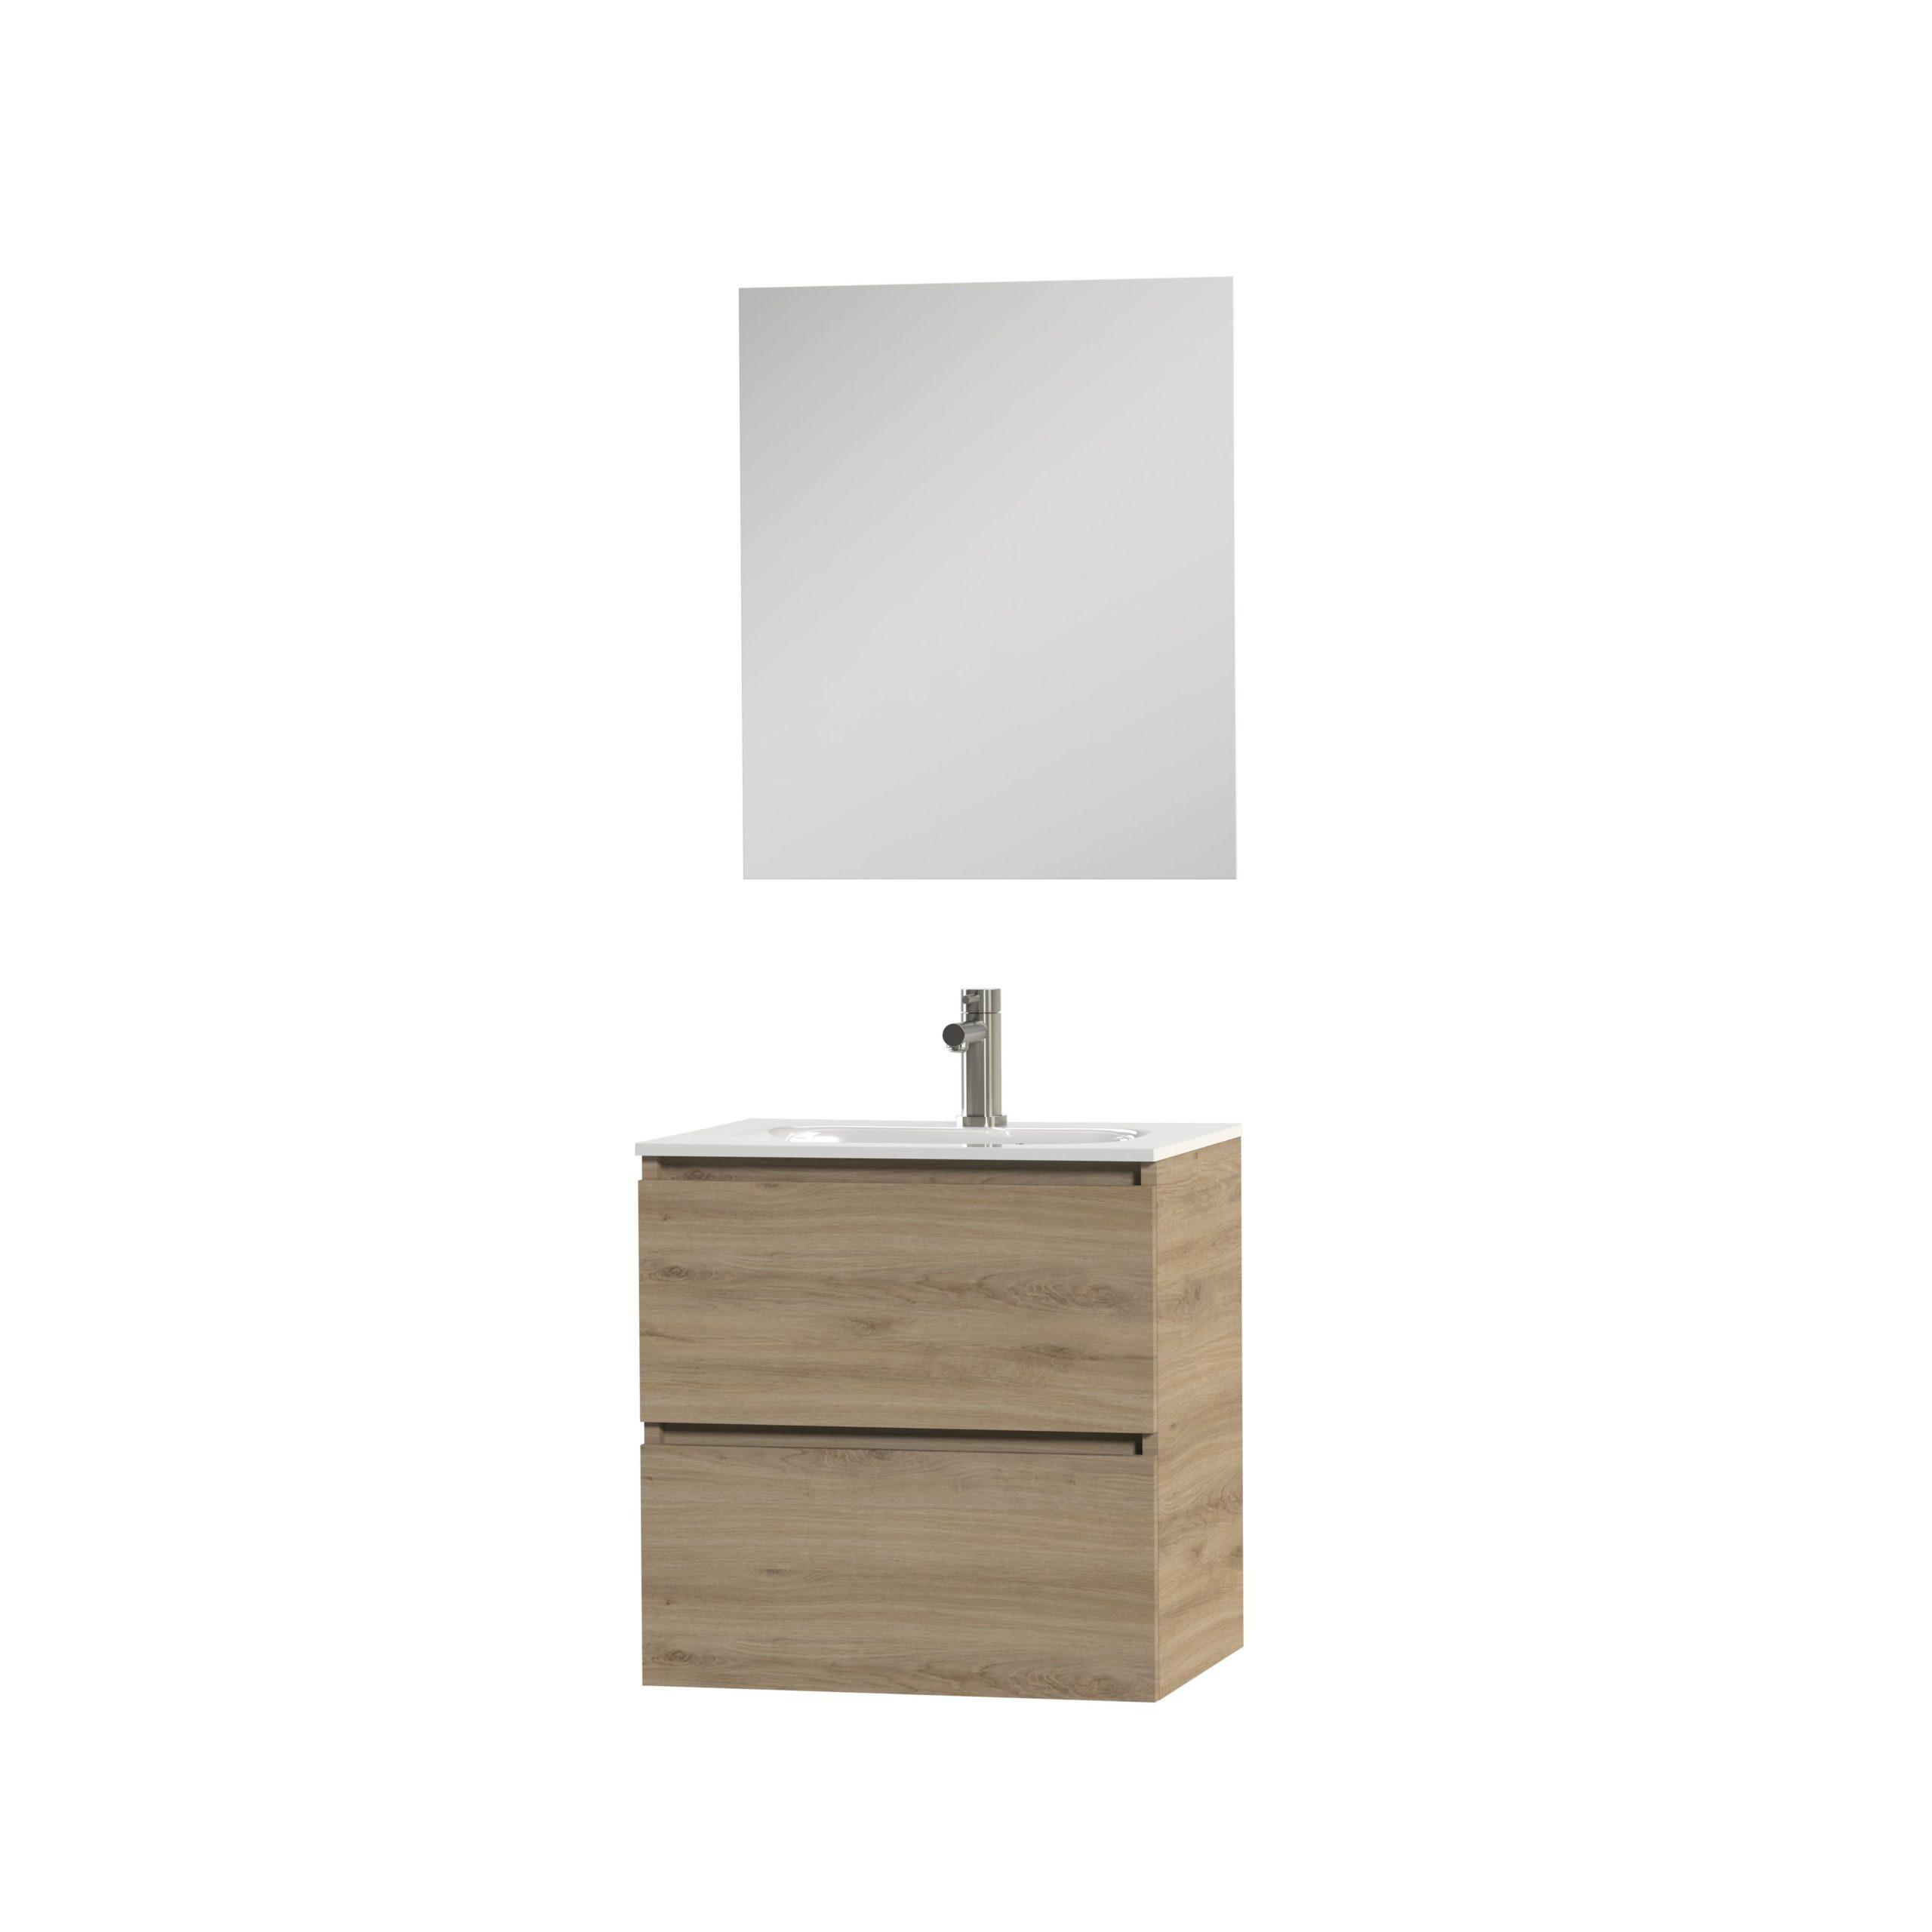 Tiger Loft badmeubel met spiegel en witte wastafel 60cm chalet eiken